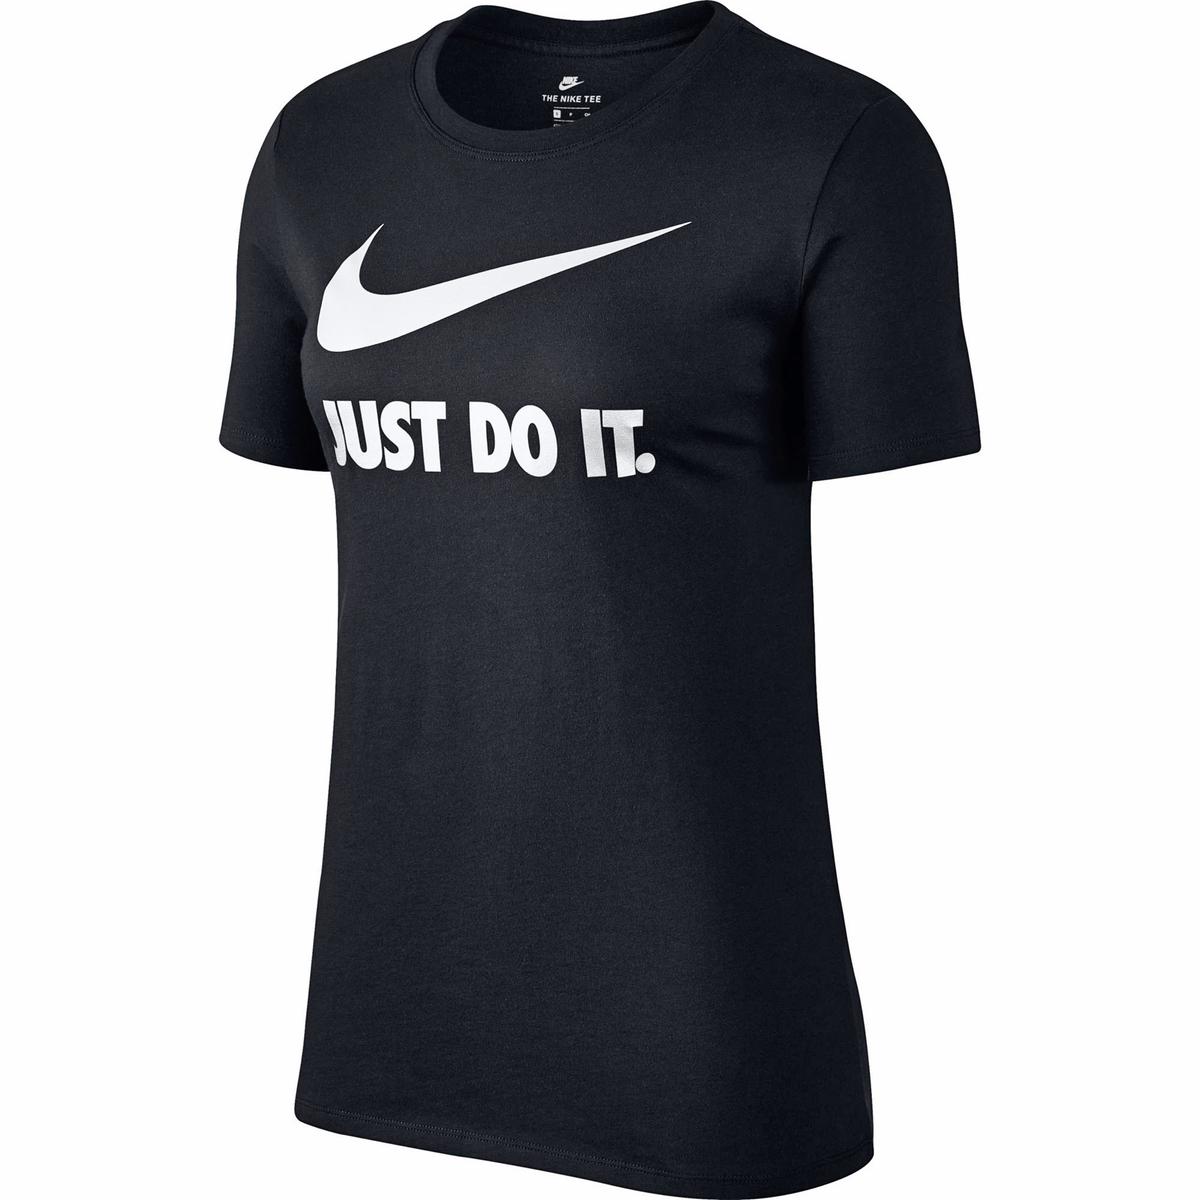 Camiseta con logotipo Just Do It de manga corta